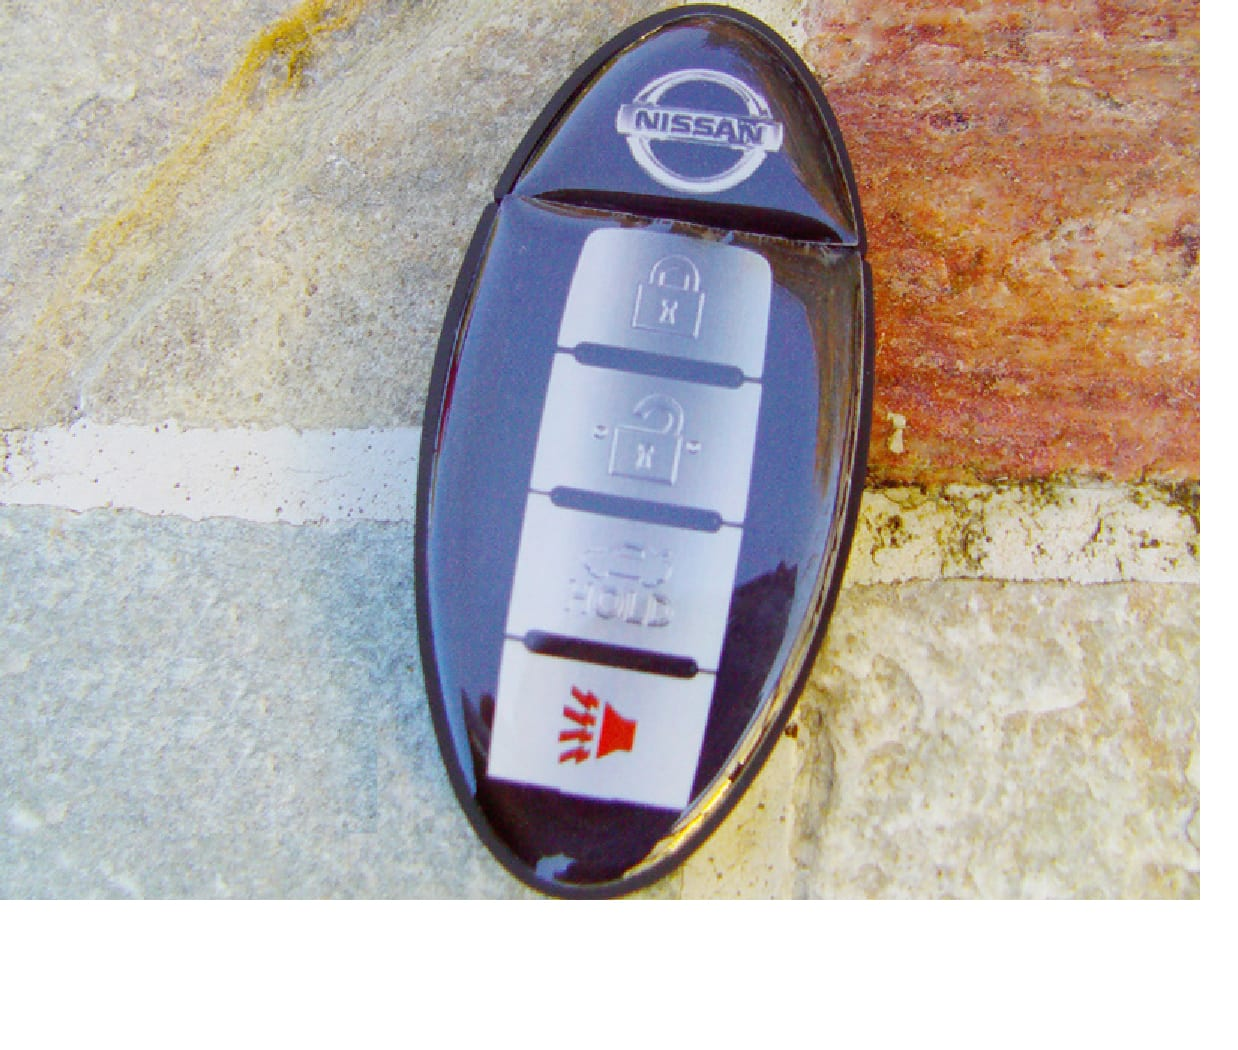 Nissan flash drive